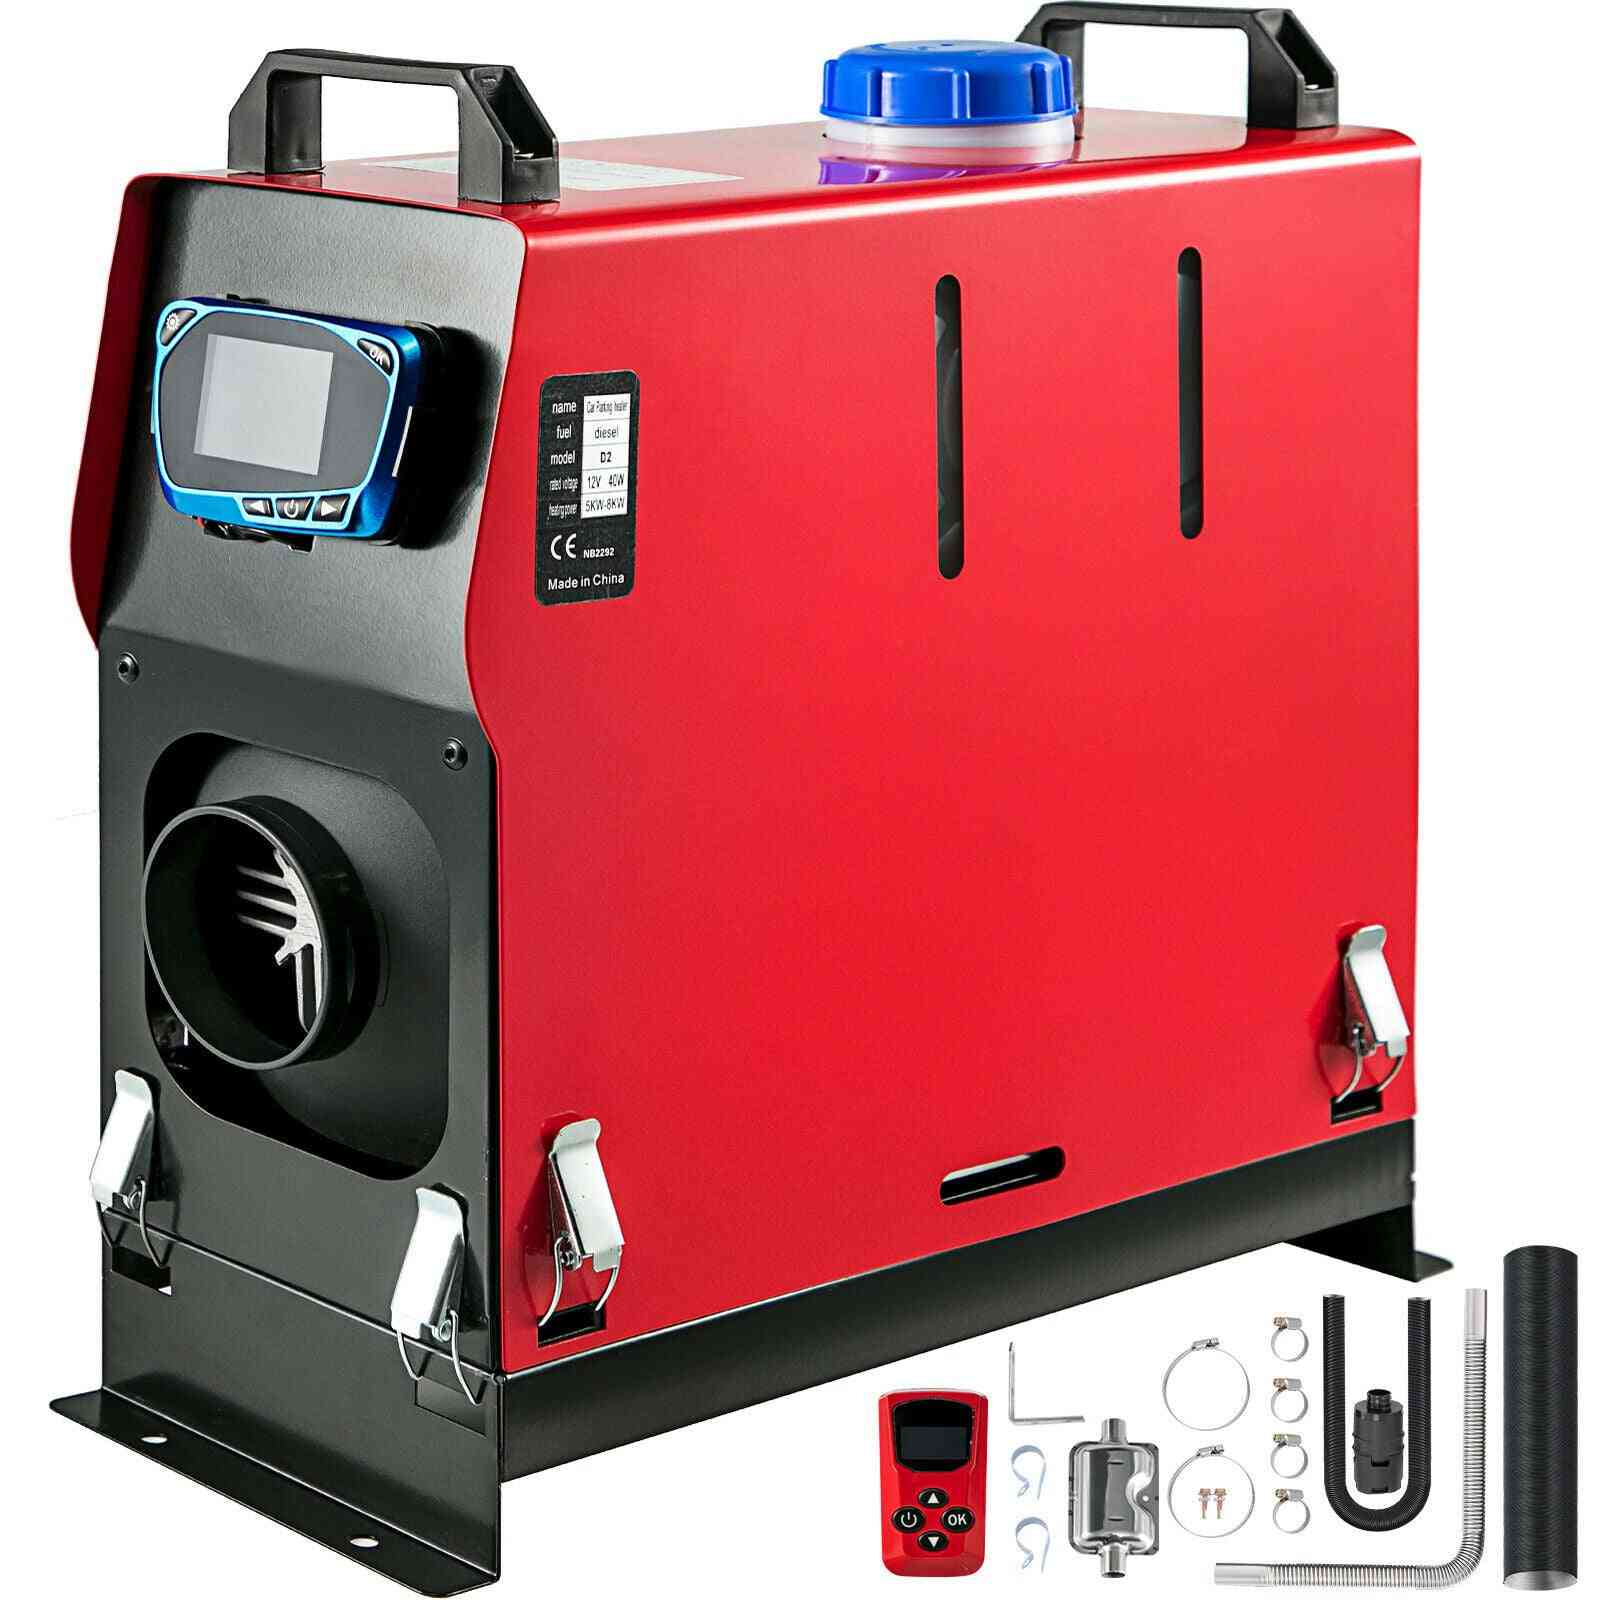 Diesel Air Heater All In One 1